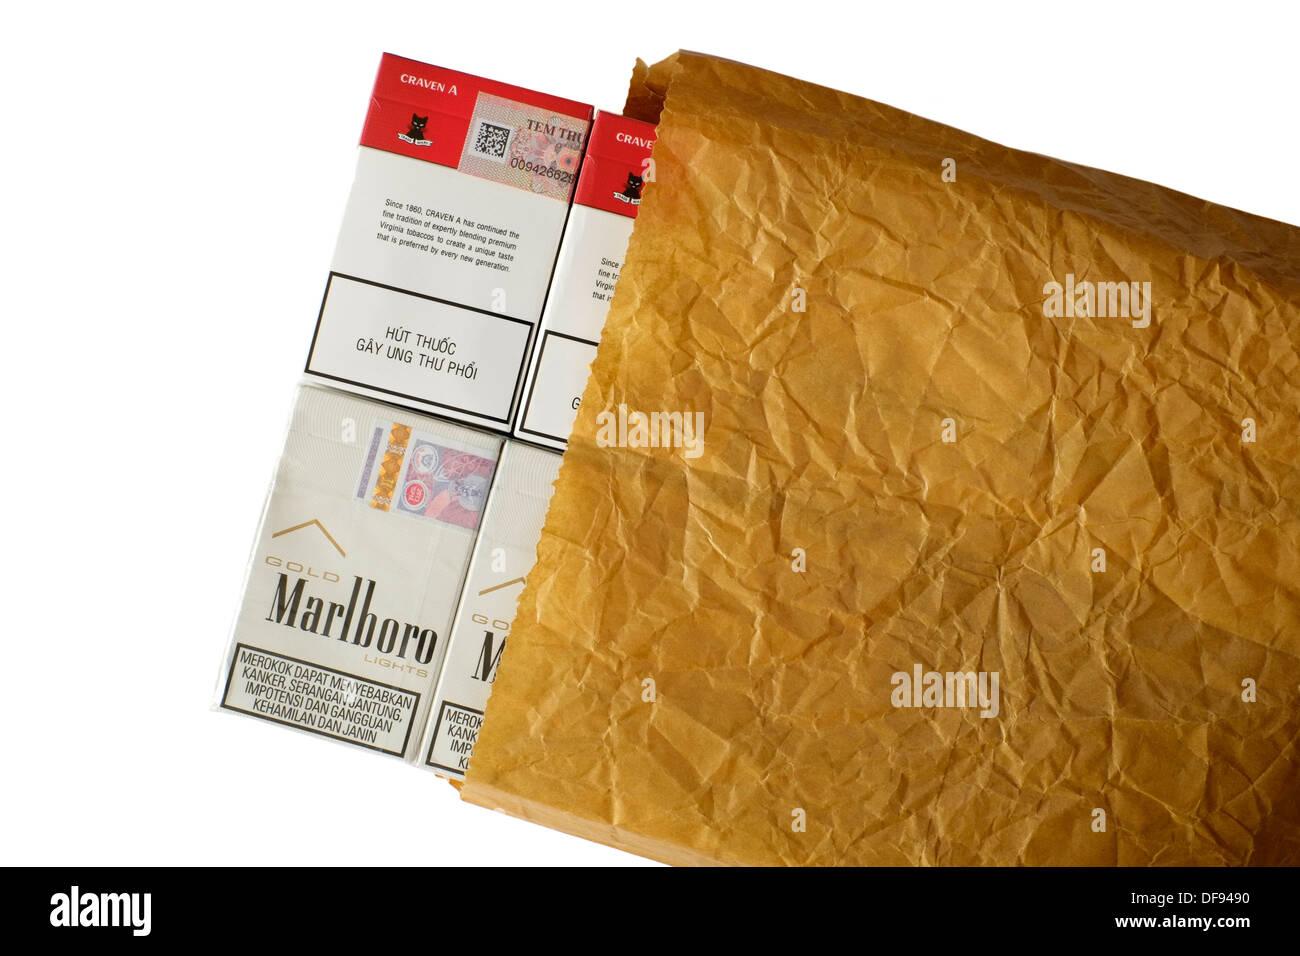 Native cigarettes Marlboro online Nevada